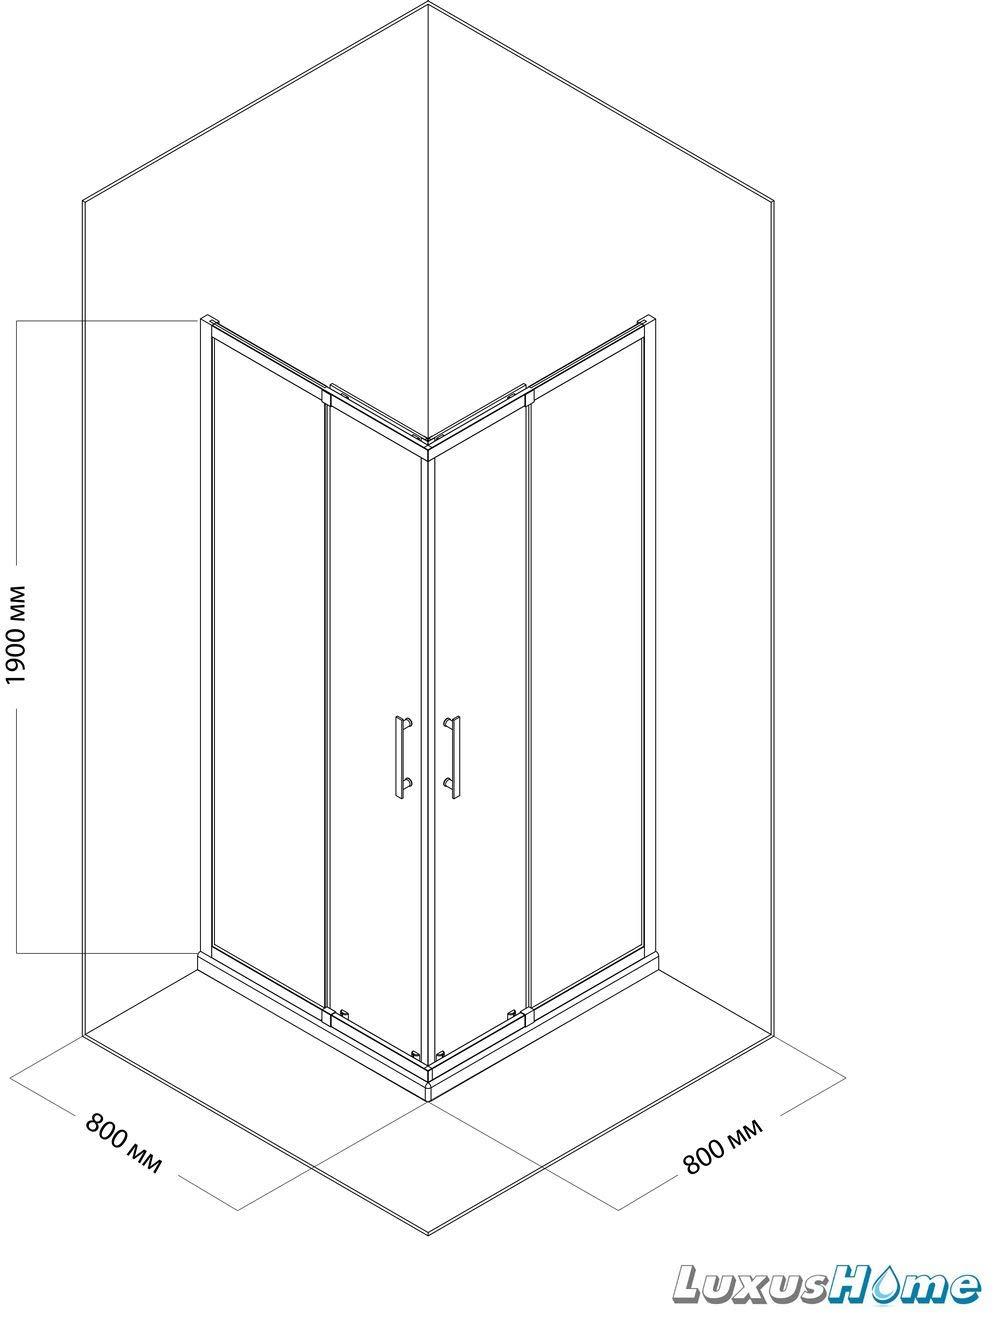 Cabina de ducha 80 x 80 x 190 cm sin plato de ducha 6 mm cristal ...